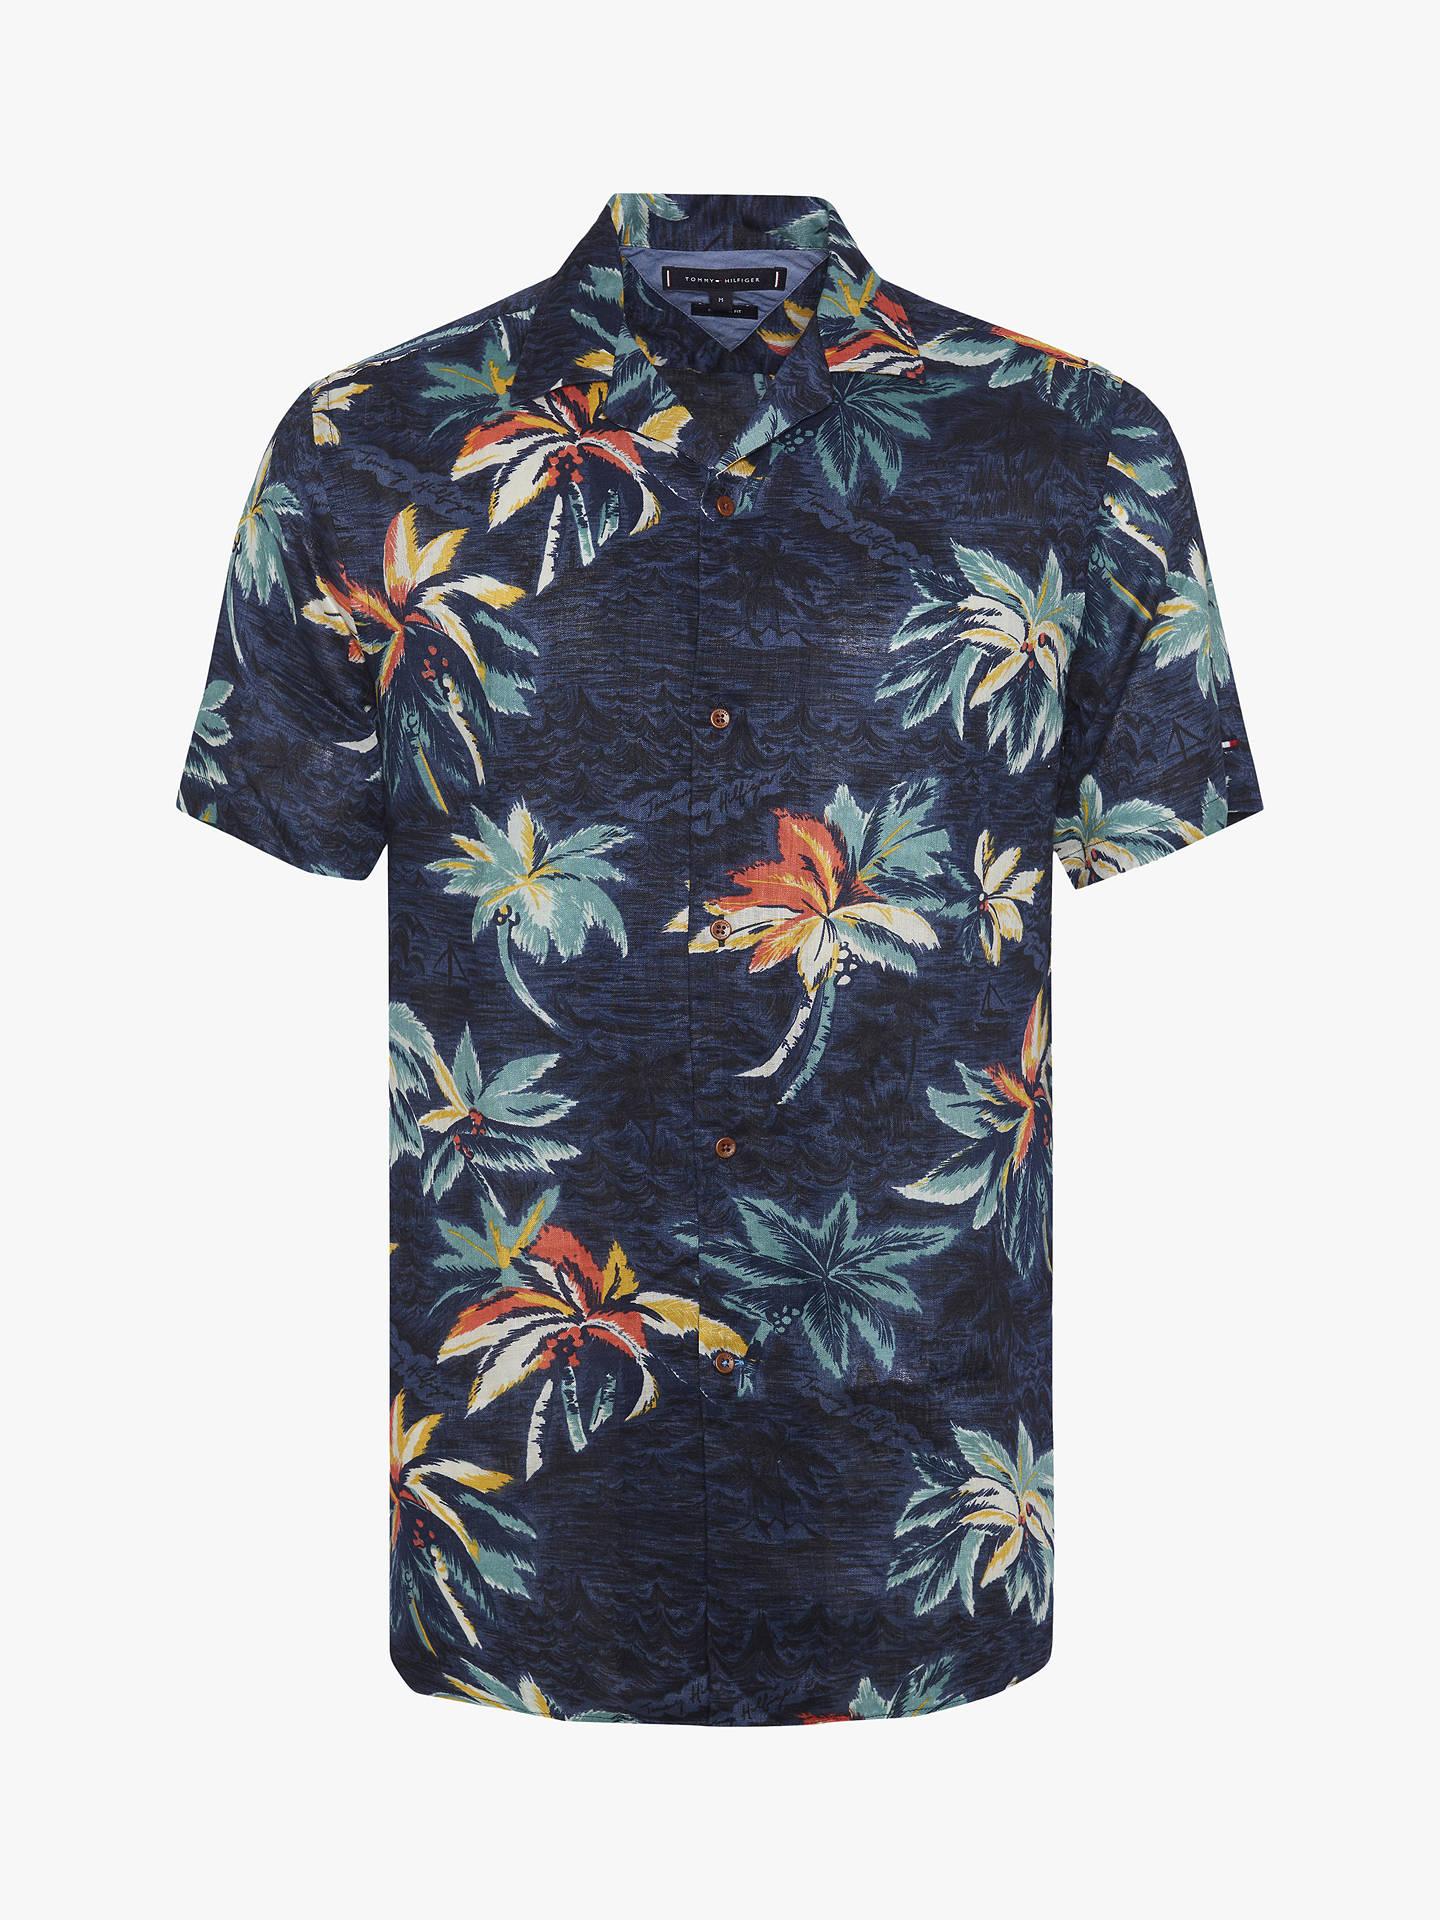 aef7bc1c84c6 Buy Tommy Hilfiger Hawaiian Print Shirt, AOP, XL Online at johnlewis.com ...